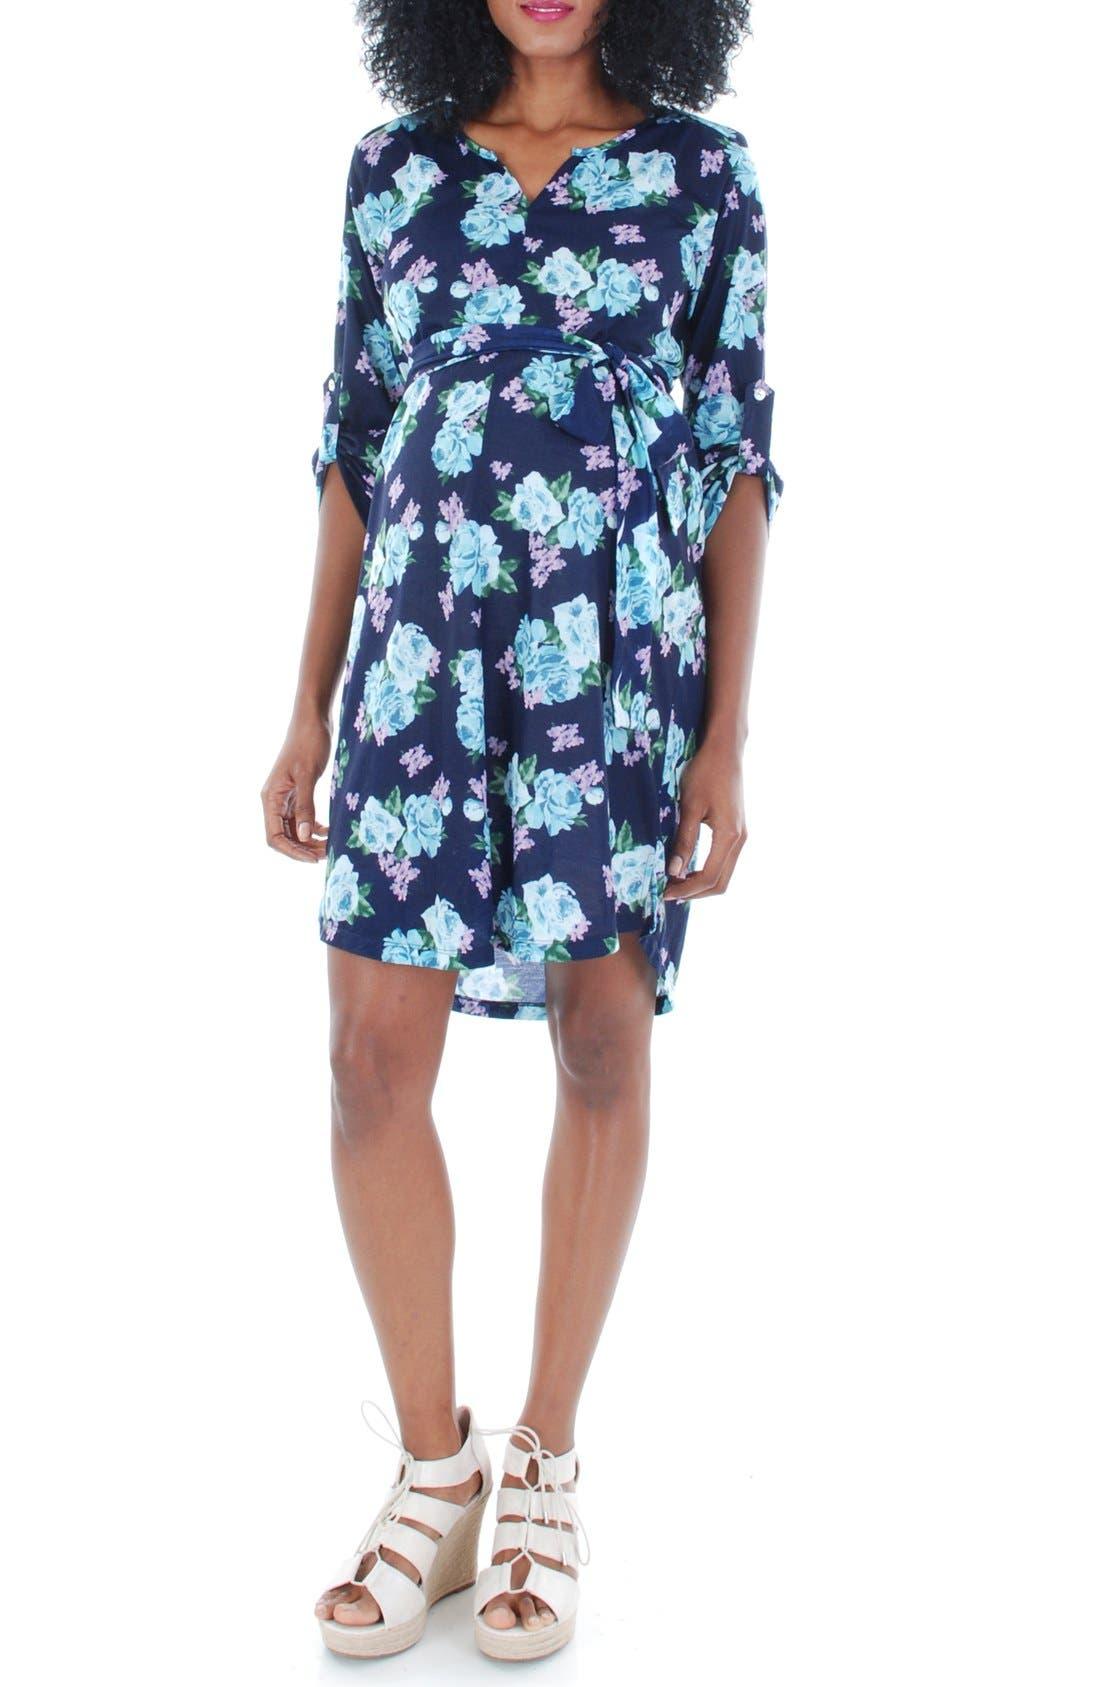 Everly Grey 'Hudson' Maternity Dress